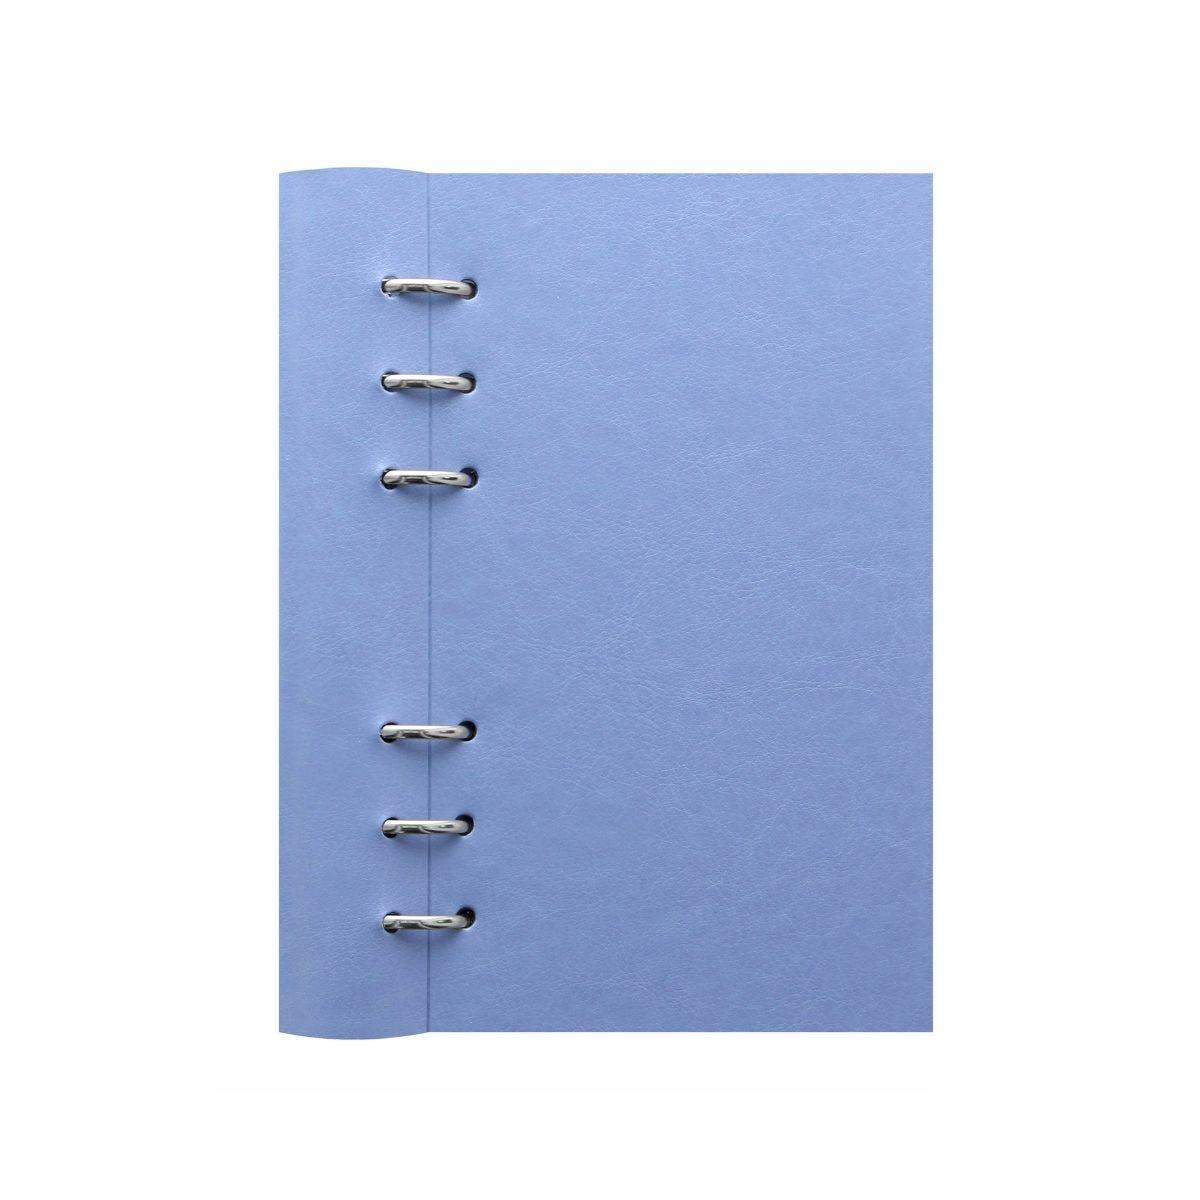 Filofax Refillable Clipbook Planner Personal Blue